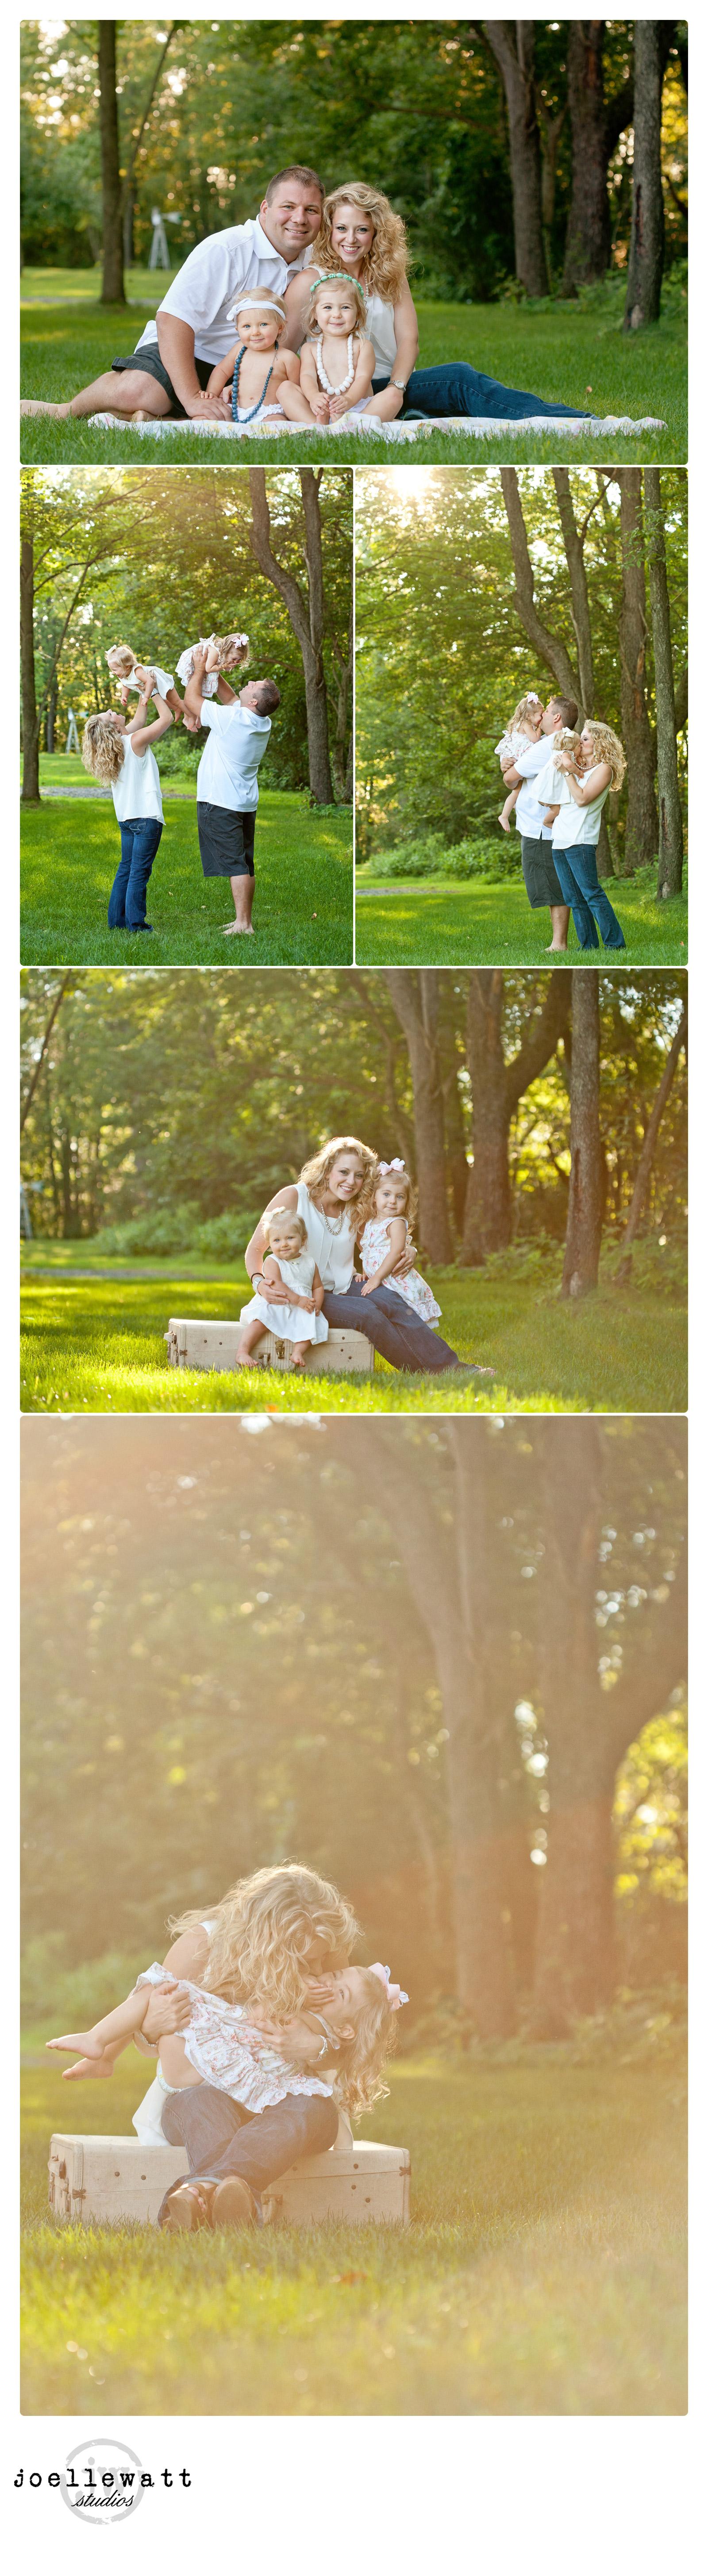 Blog-Collage-1375275449756.jpg